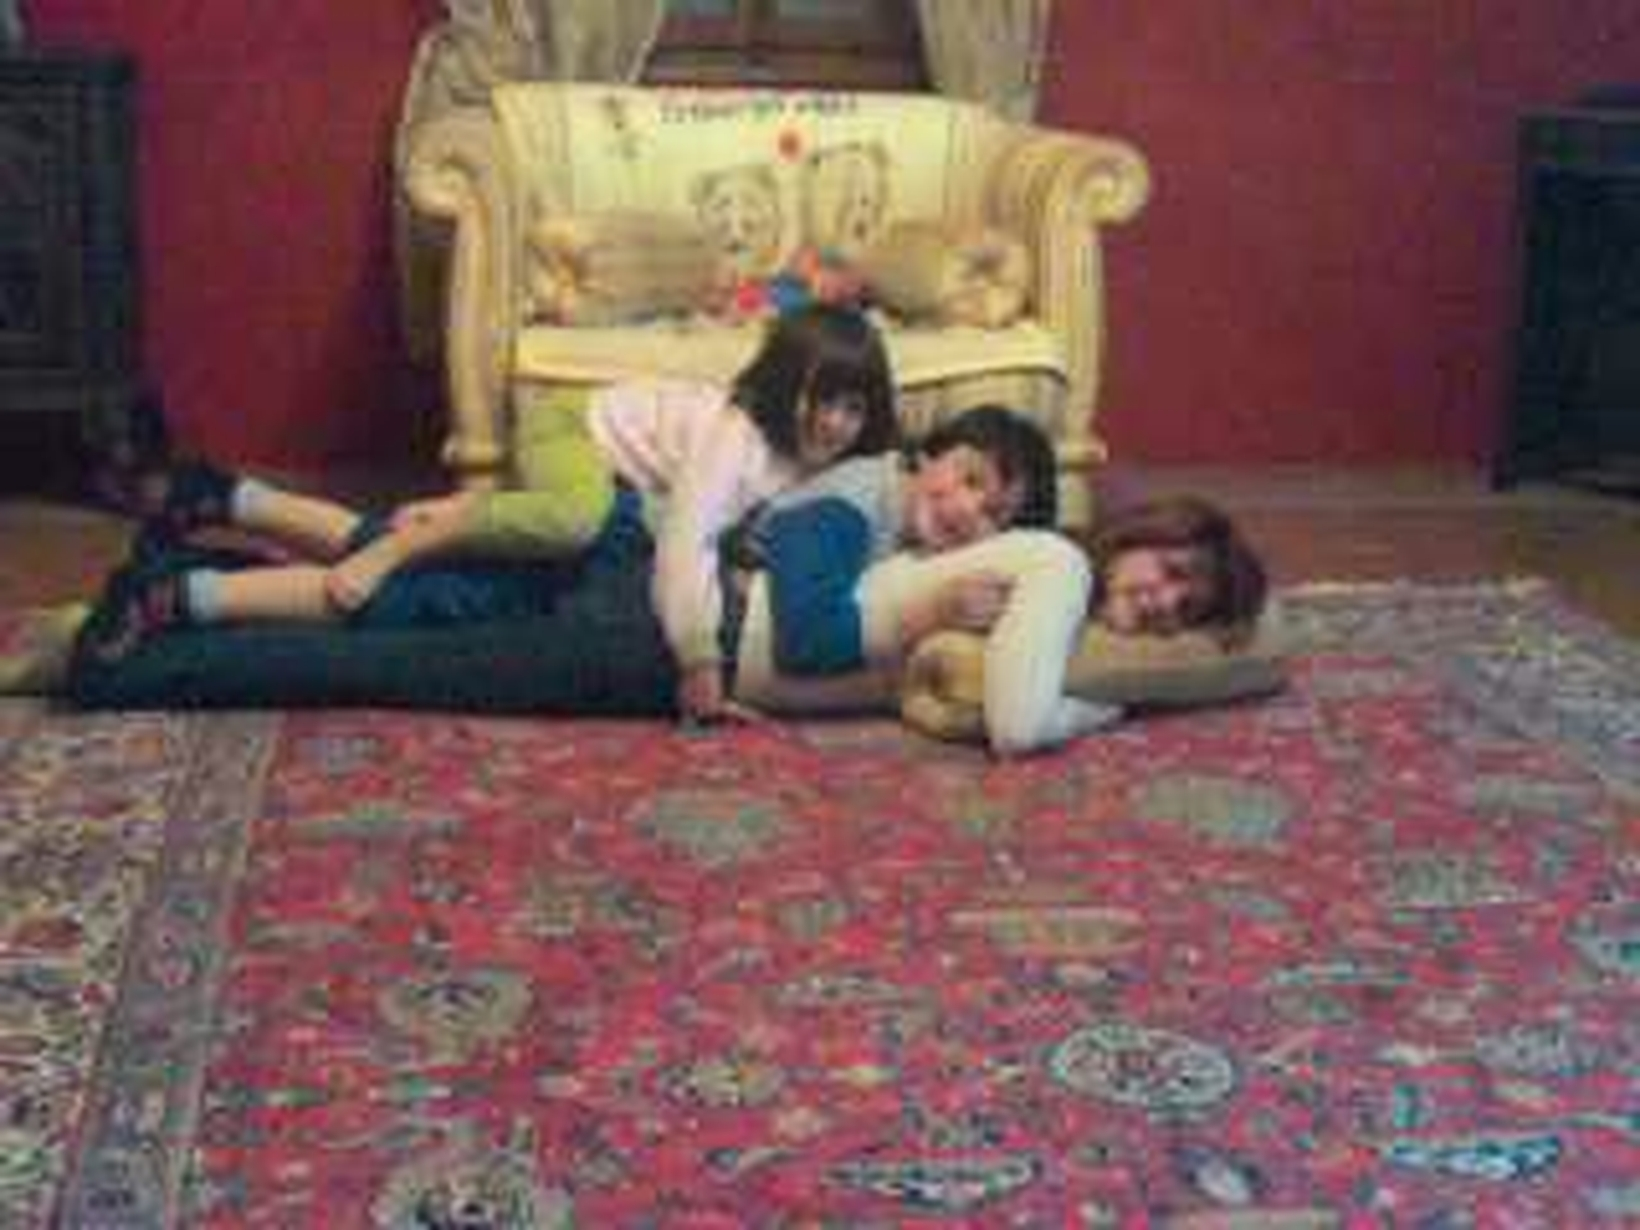 Marialuisa & Luca from Valdobbiadene, Italy